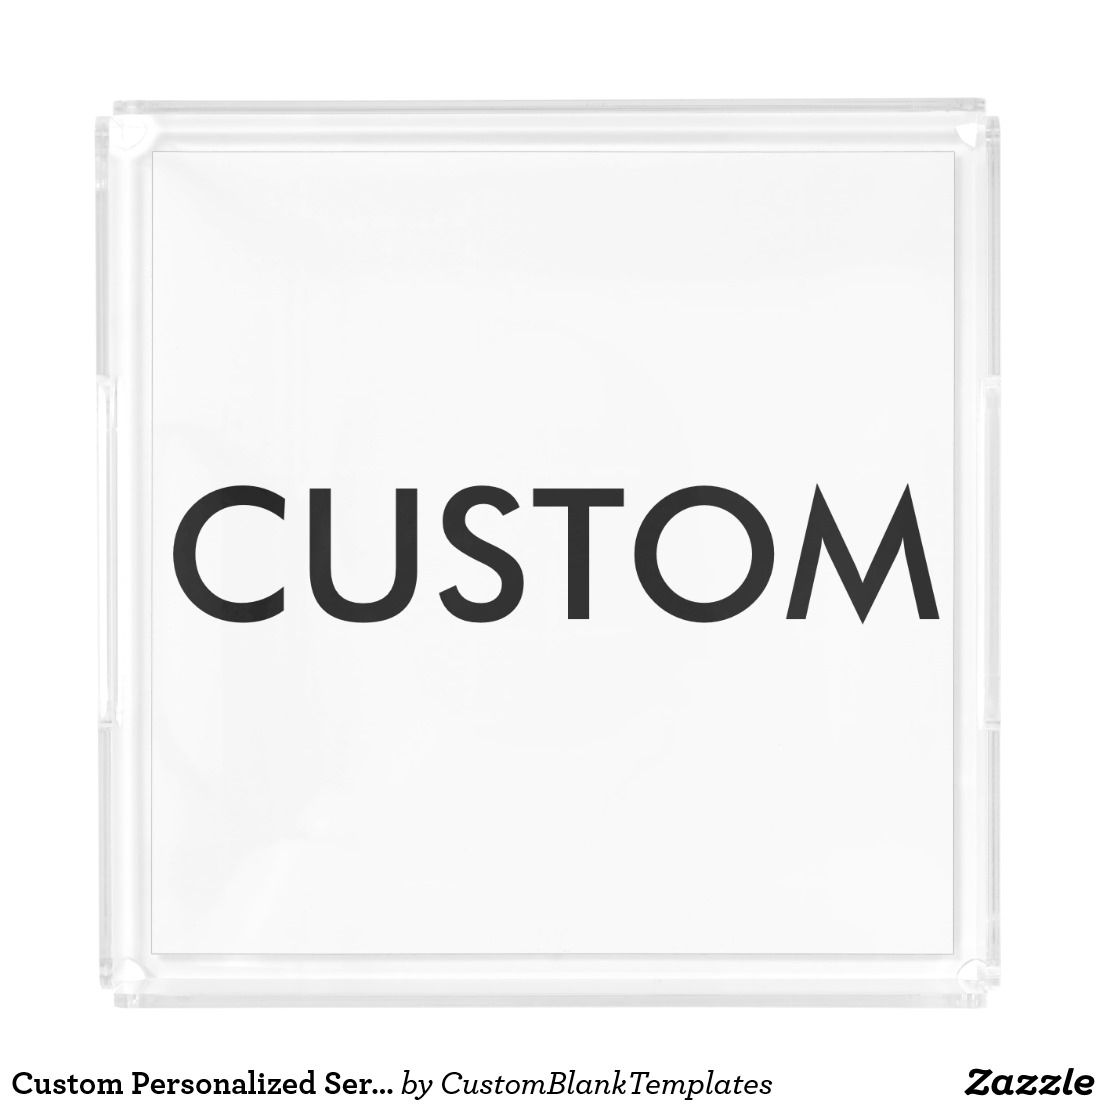 Custom Personalized Serving Trays Blank Template | Custom ...